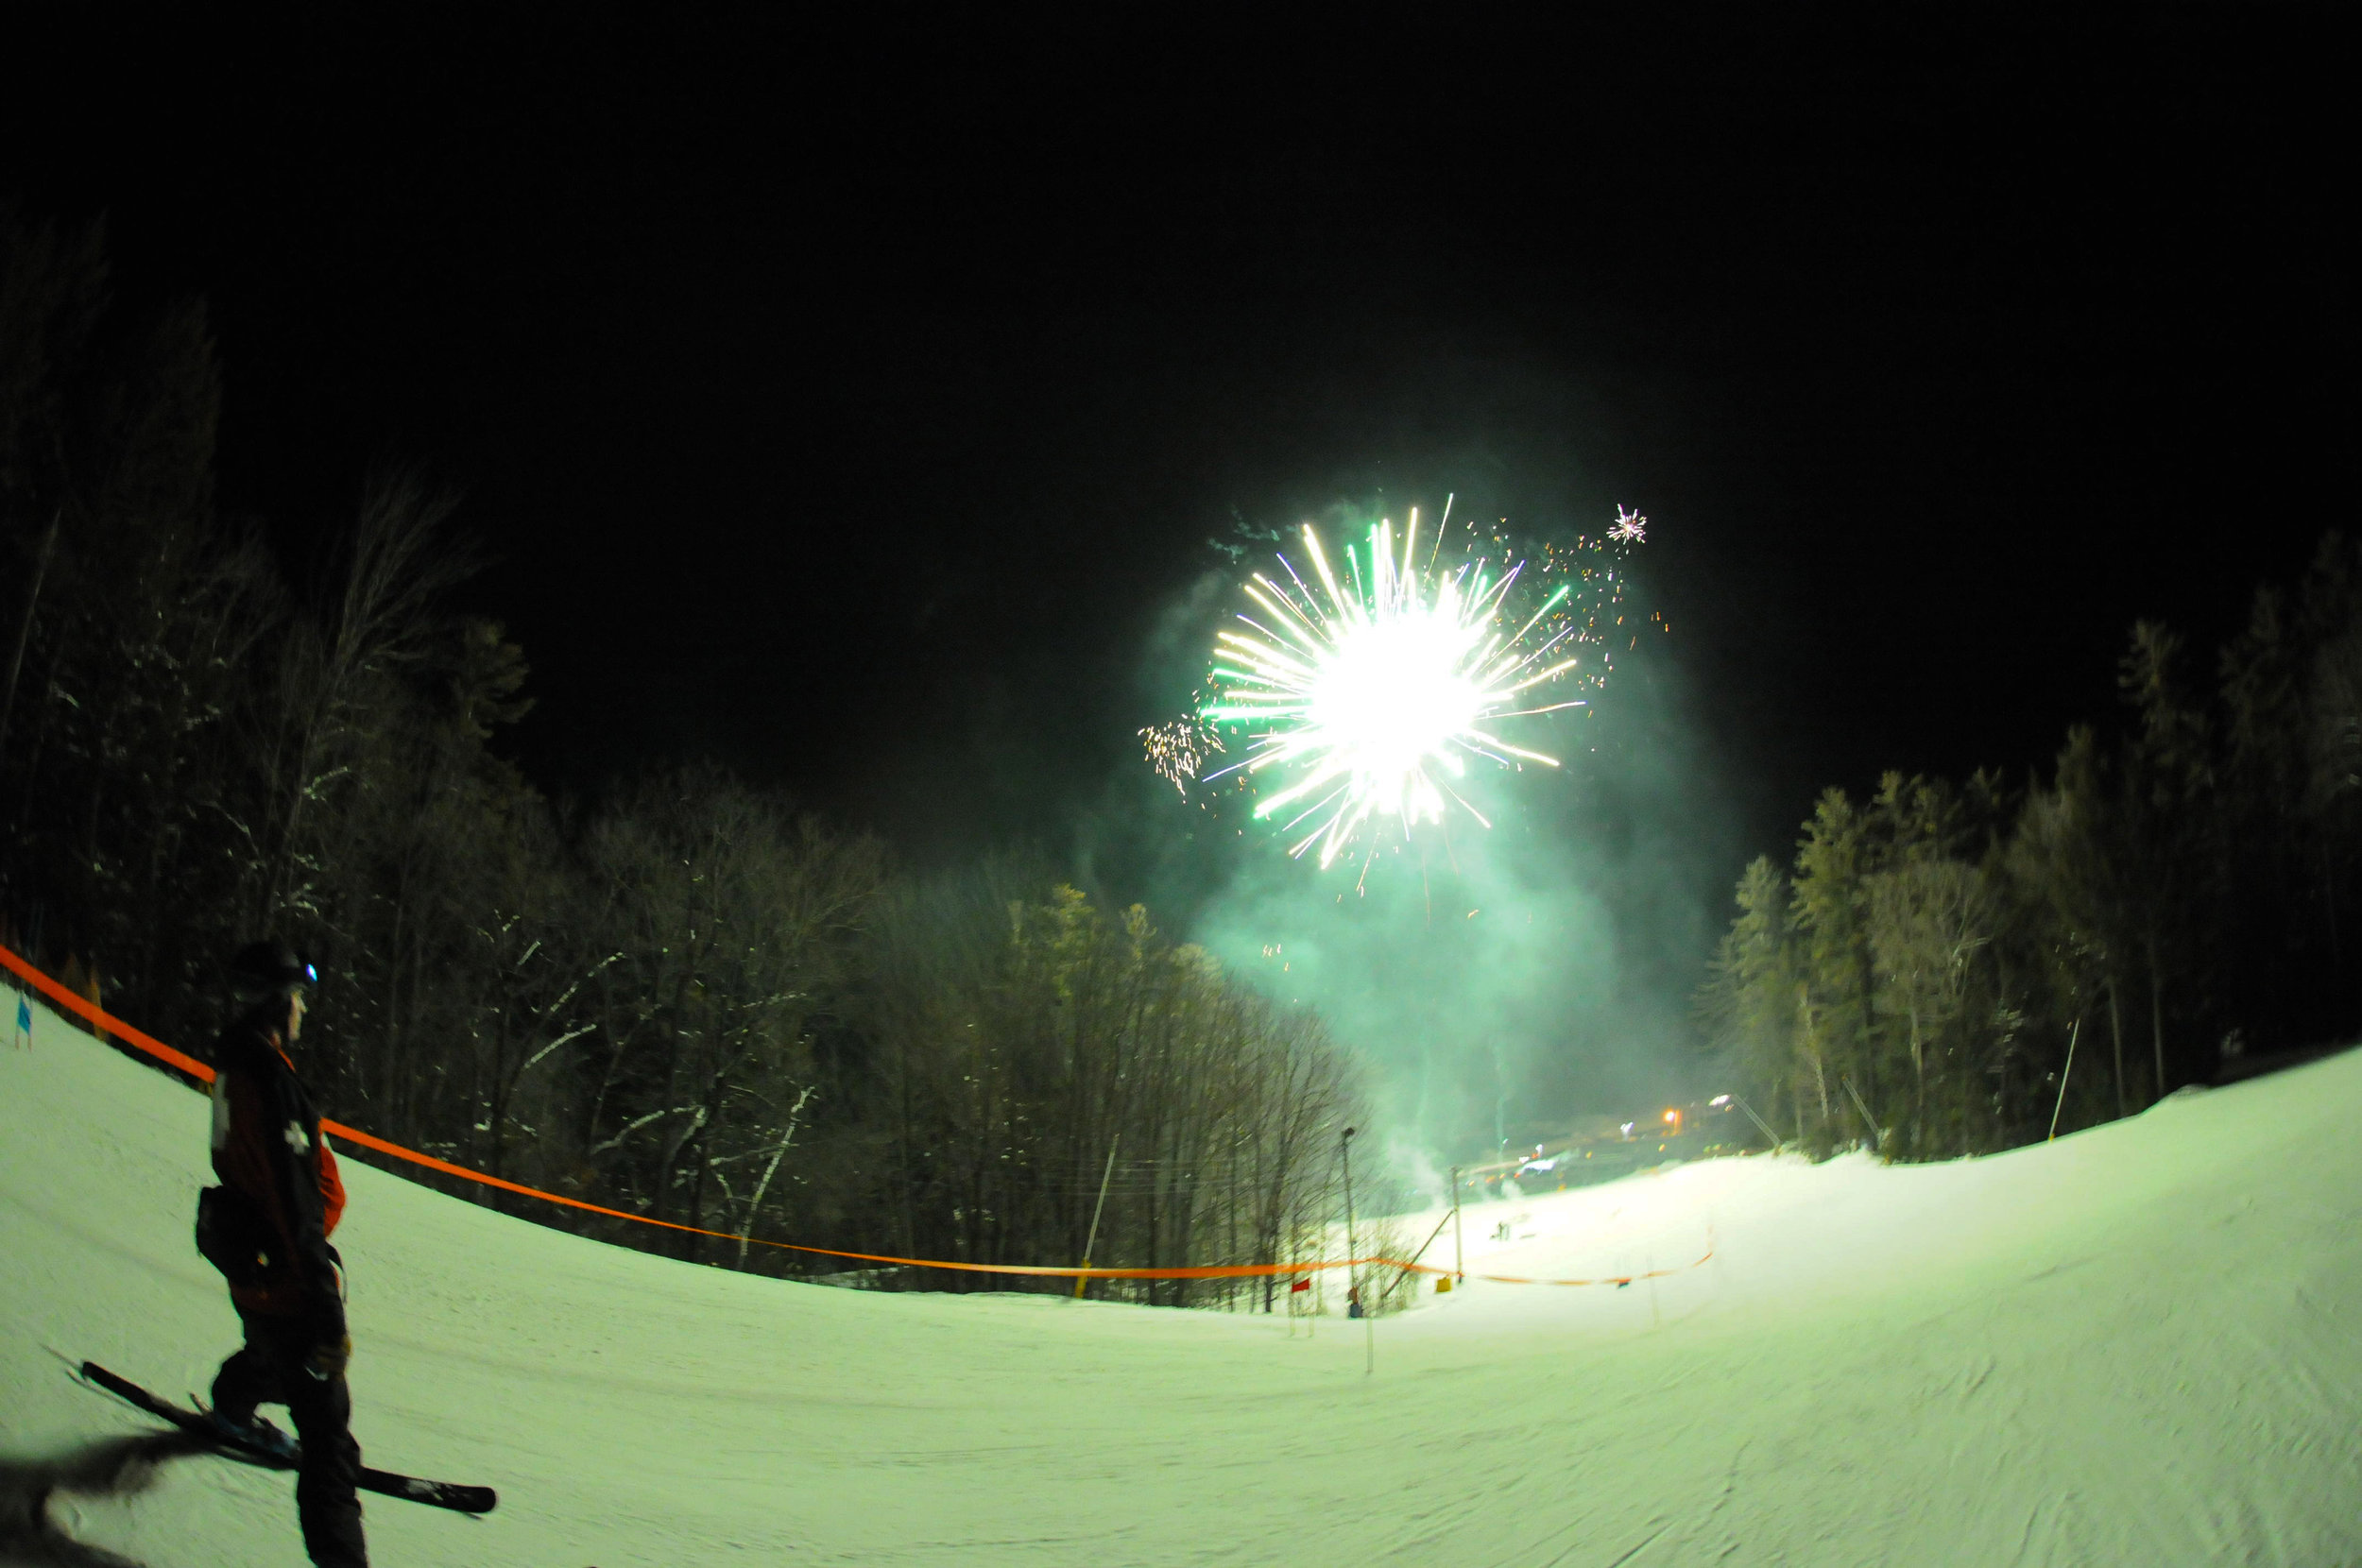 KP_CynthiasChallenge_Fireworks2_31718.jpg